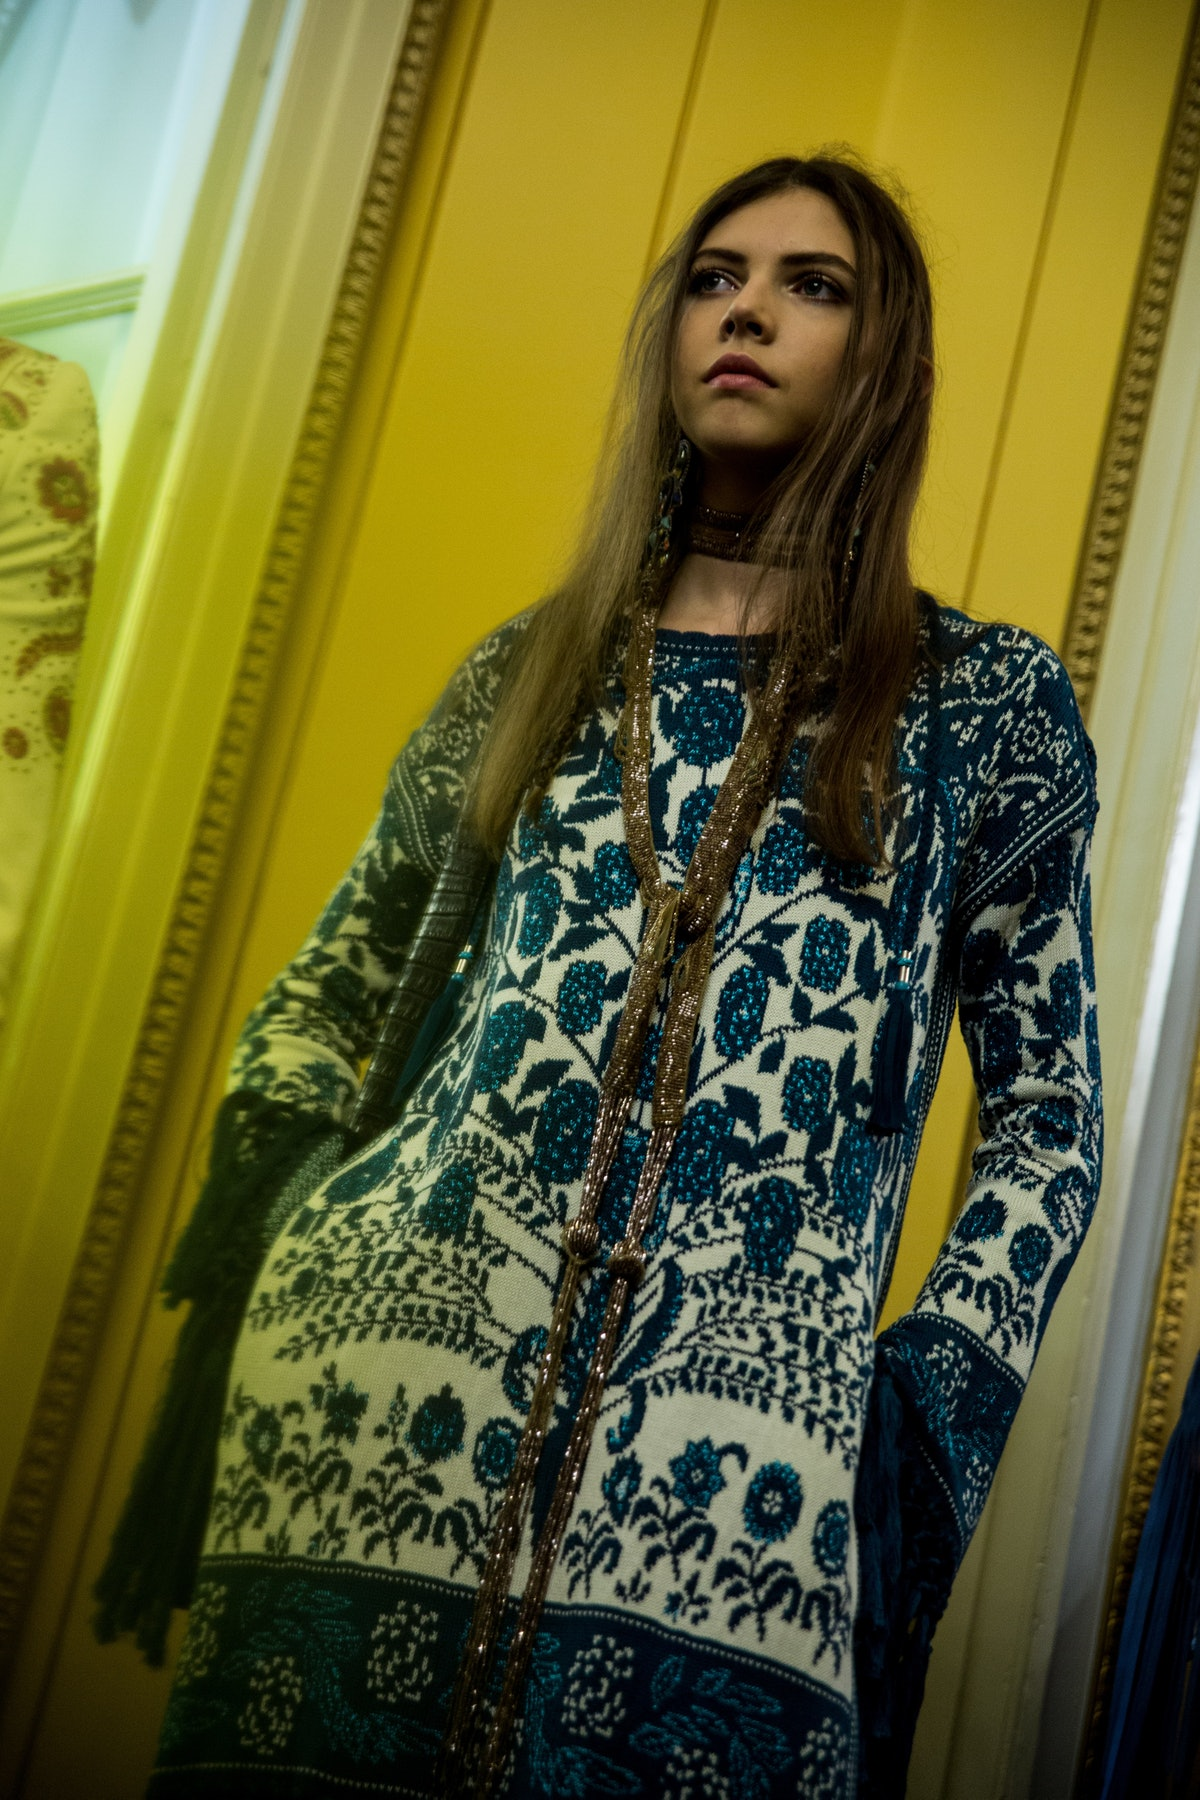 Roberto Cavalli SS17 | Portia Hunt for W Magazine 04.jpg